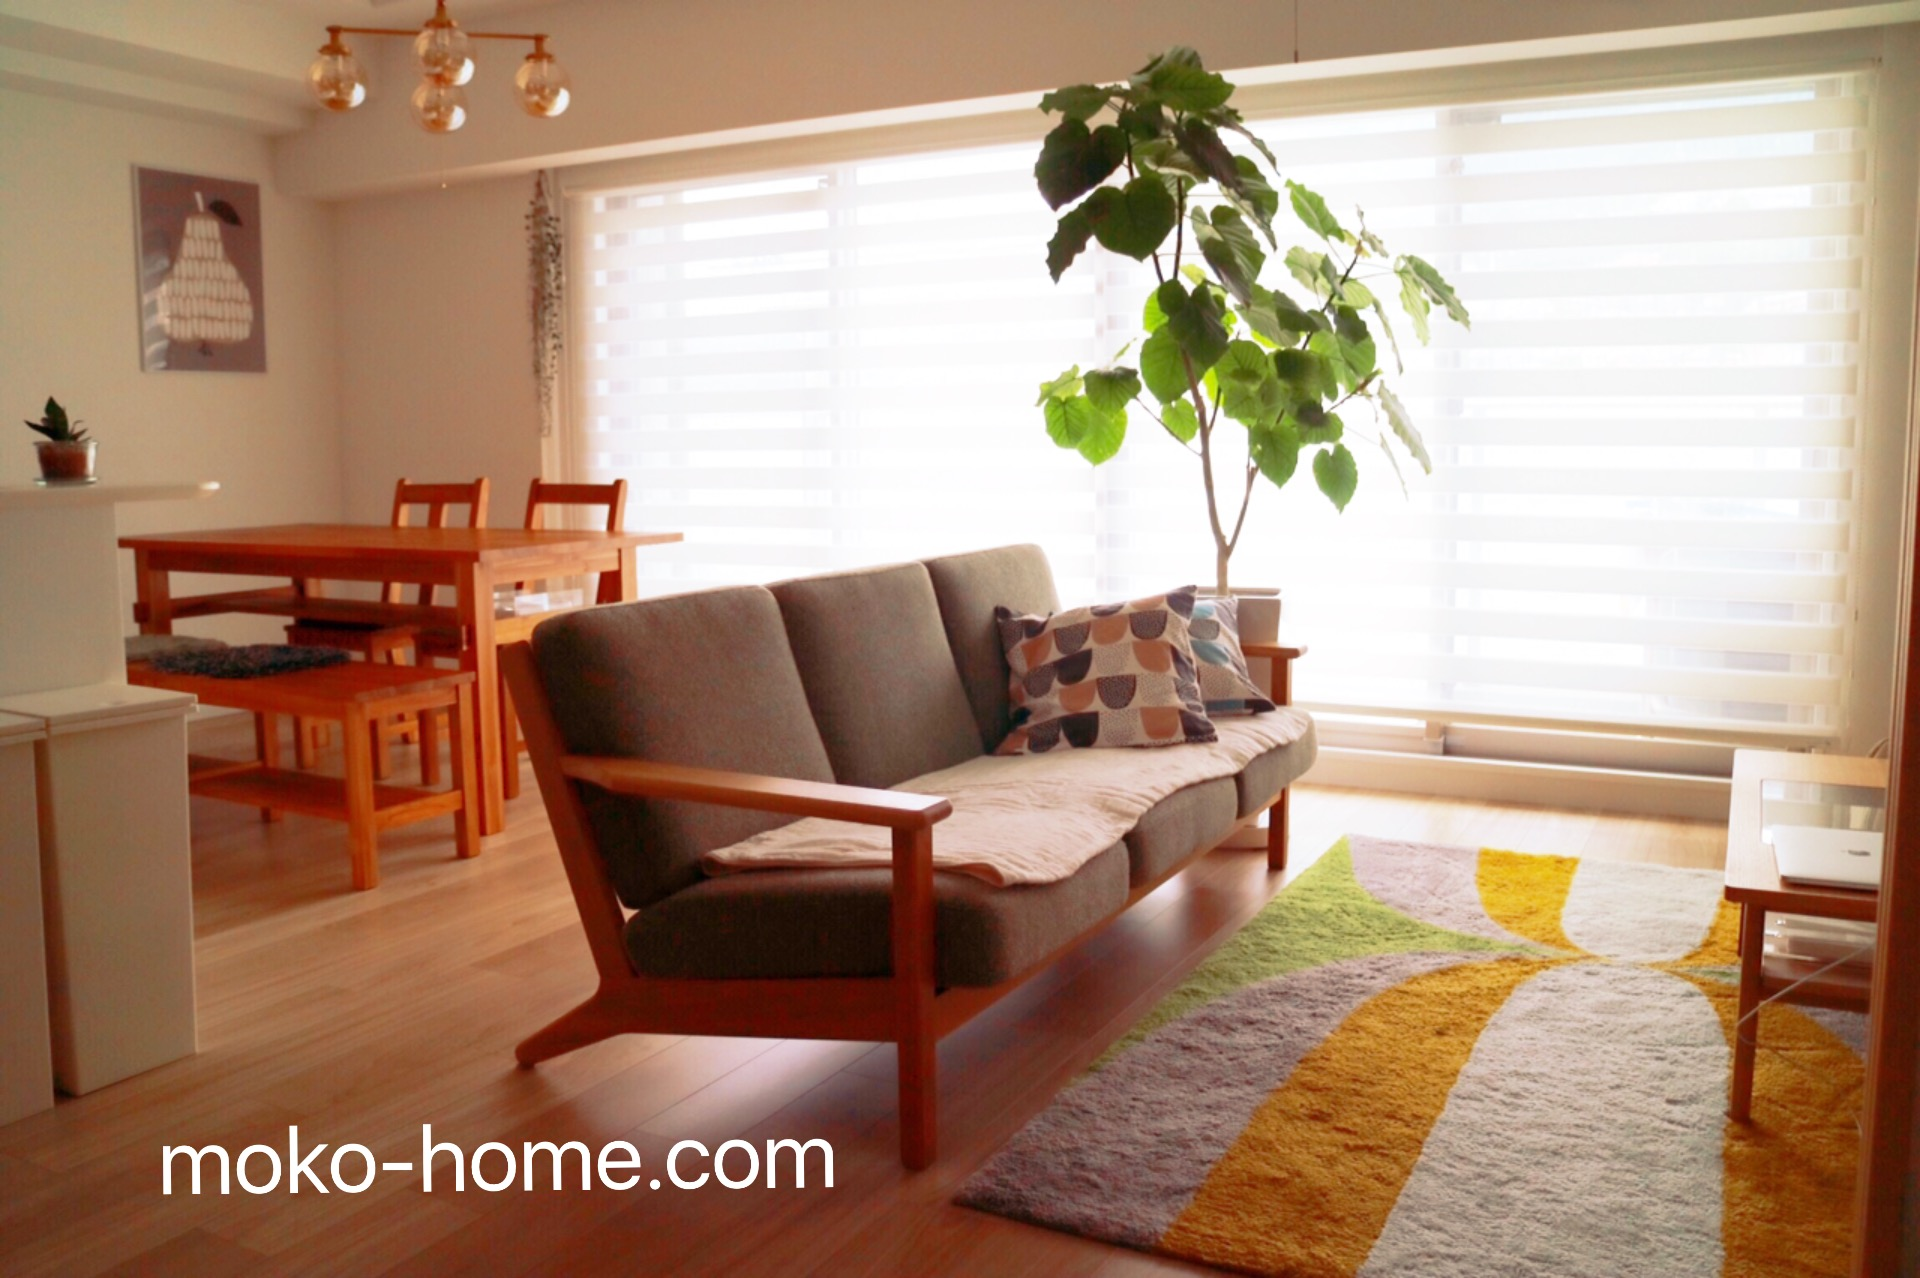 【Web内覧会】unico(ウニコ)のお部屋作り相談会で新居の家具選び